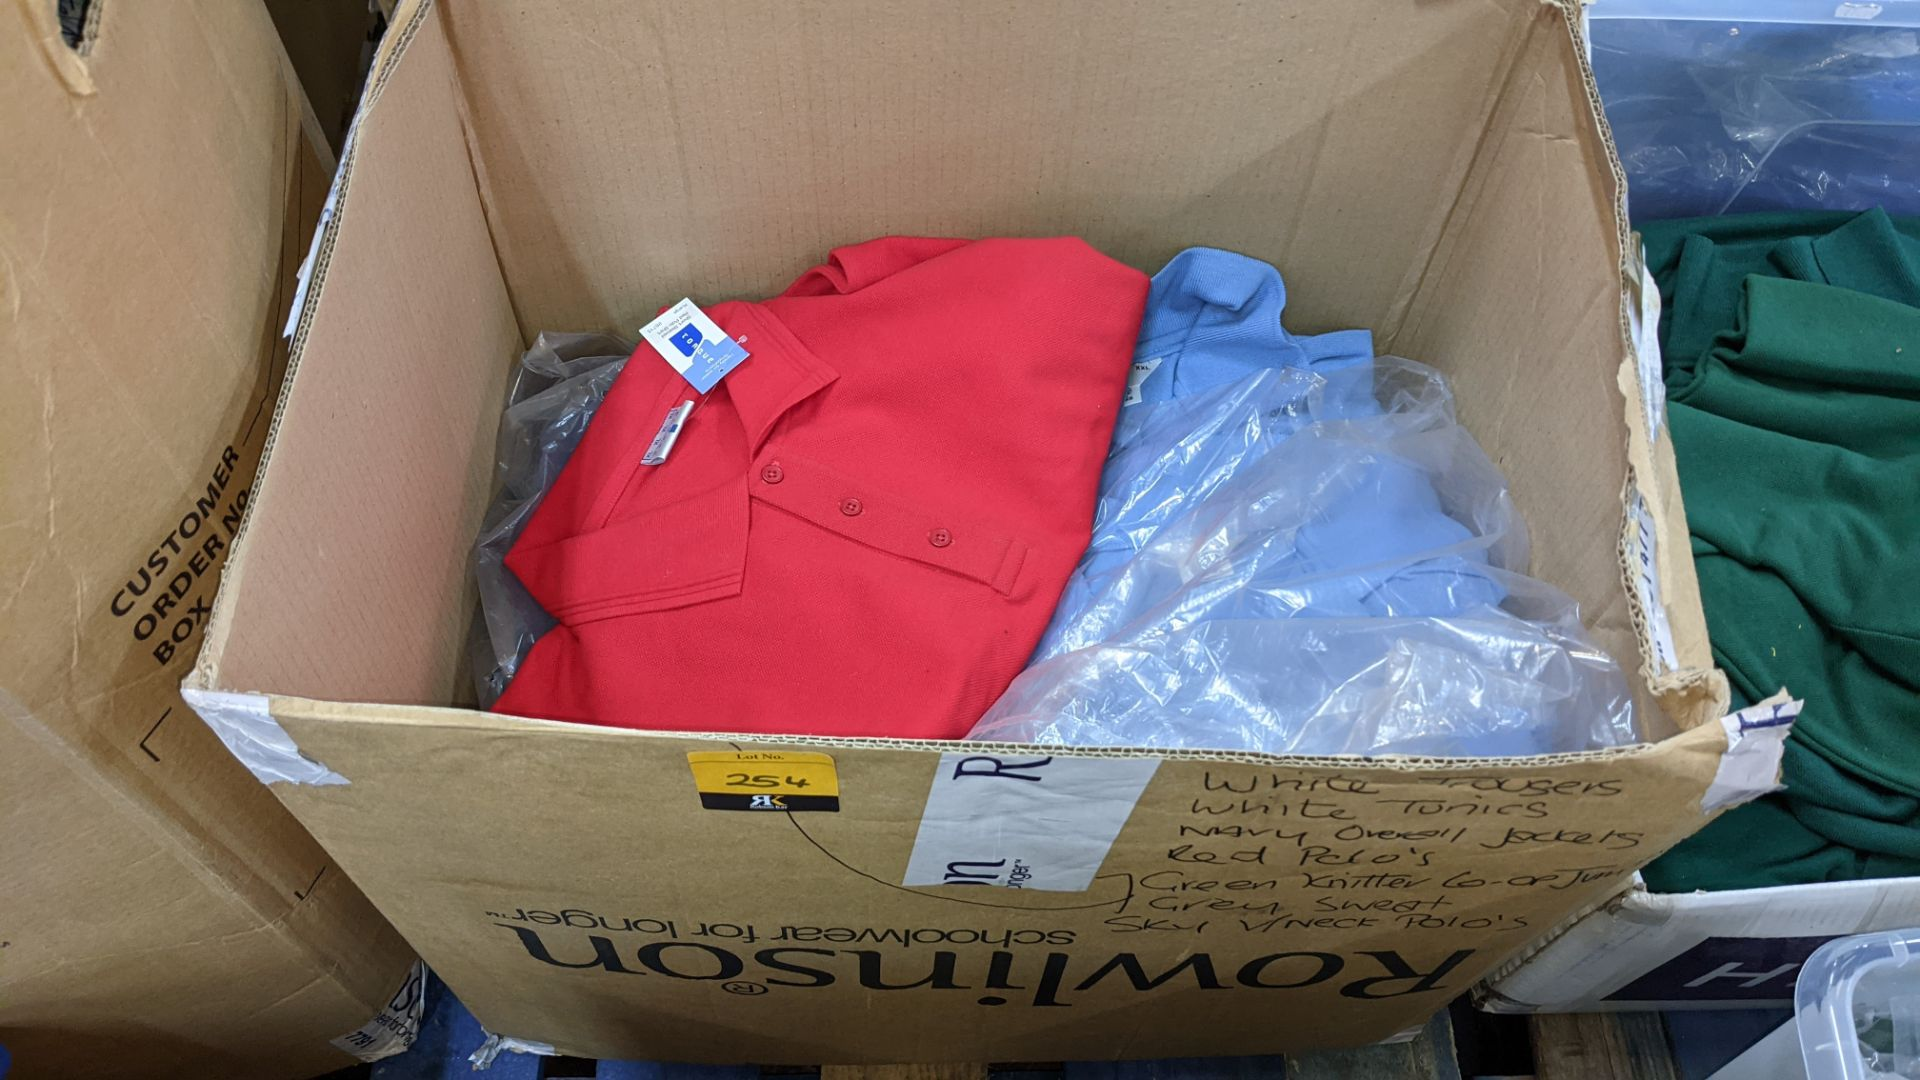 20 assorted polo shirts - 1 large box